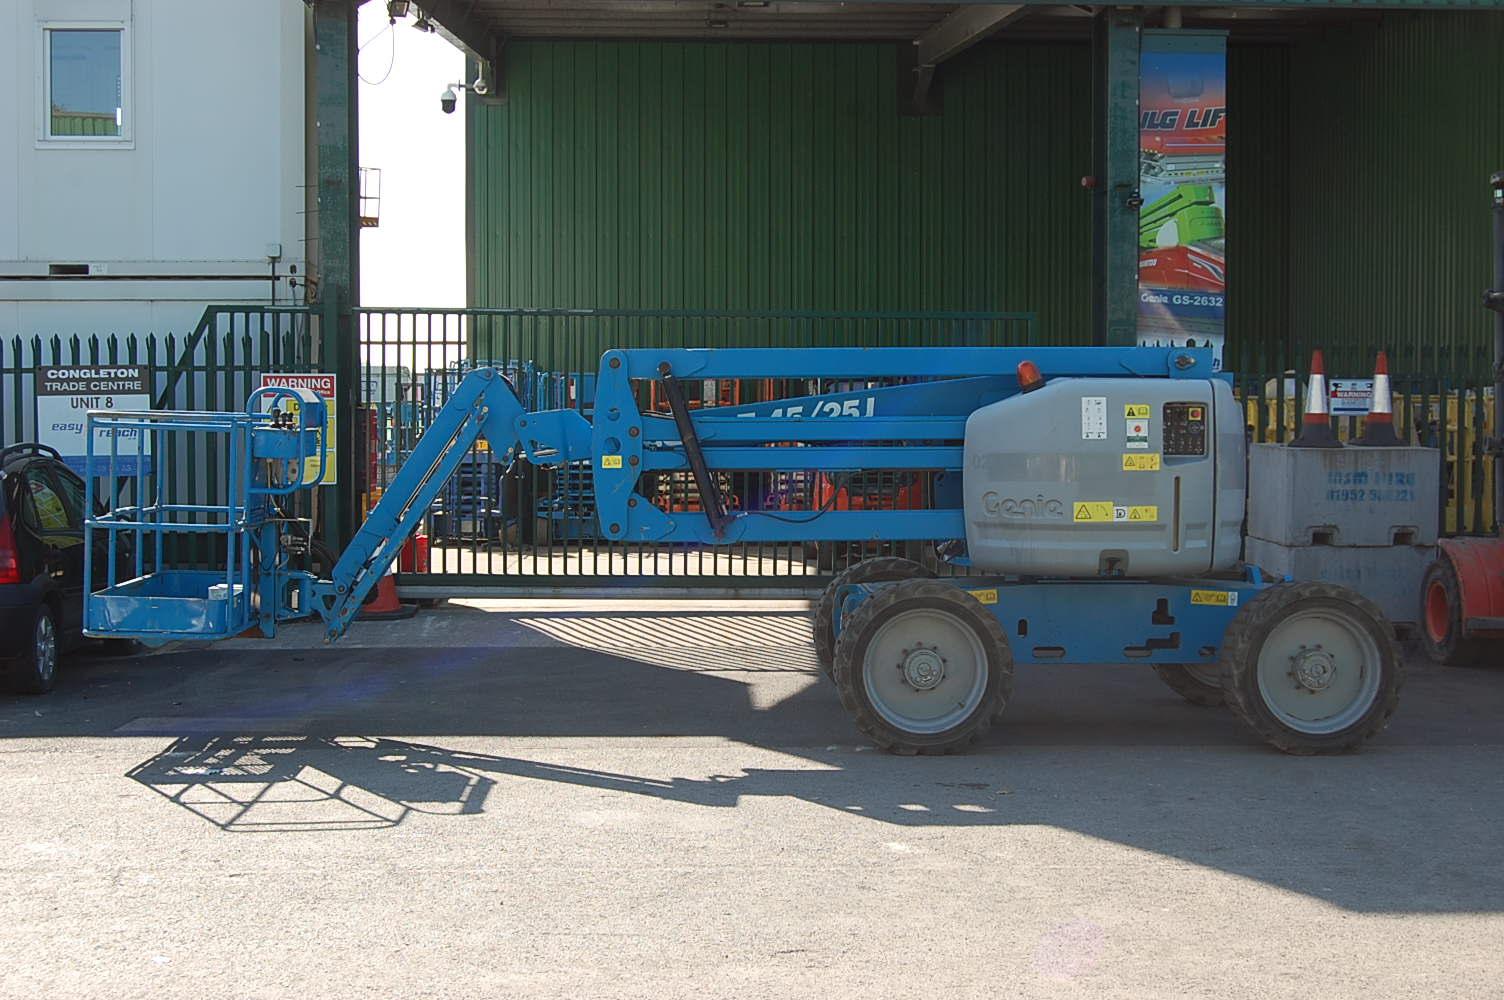 2013 Genie Z45/25J Rough Terrain Diesel Boom Lift 16m